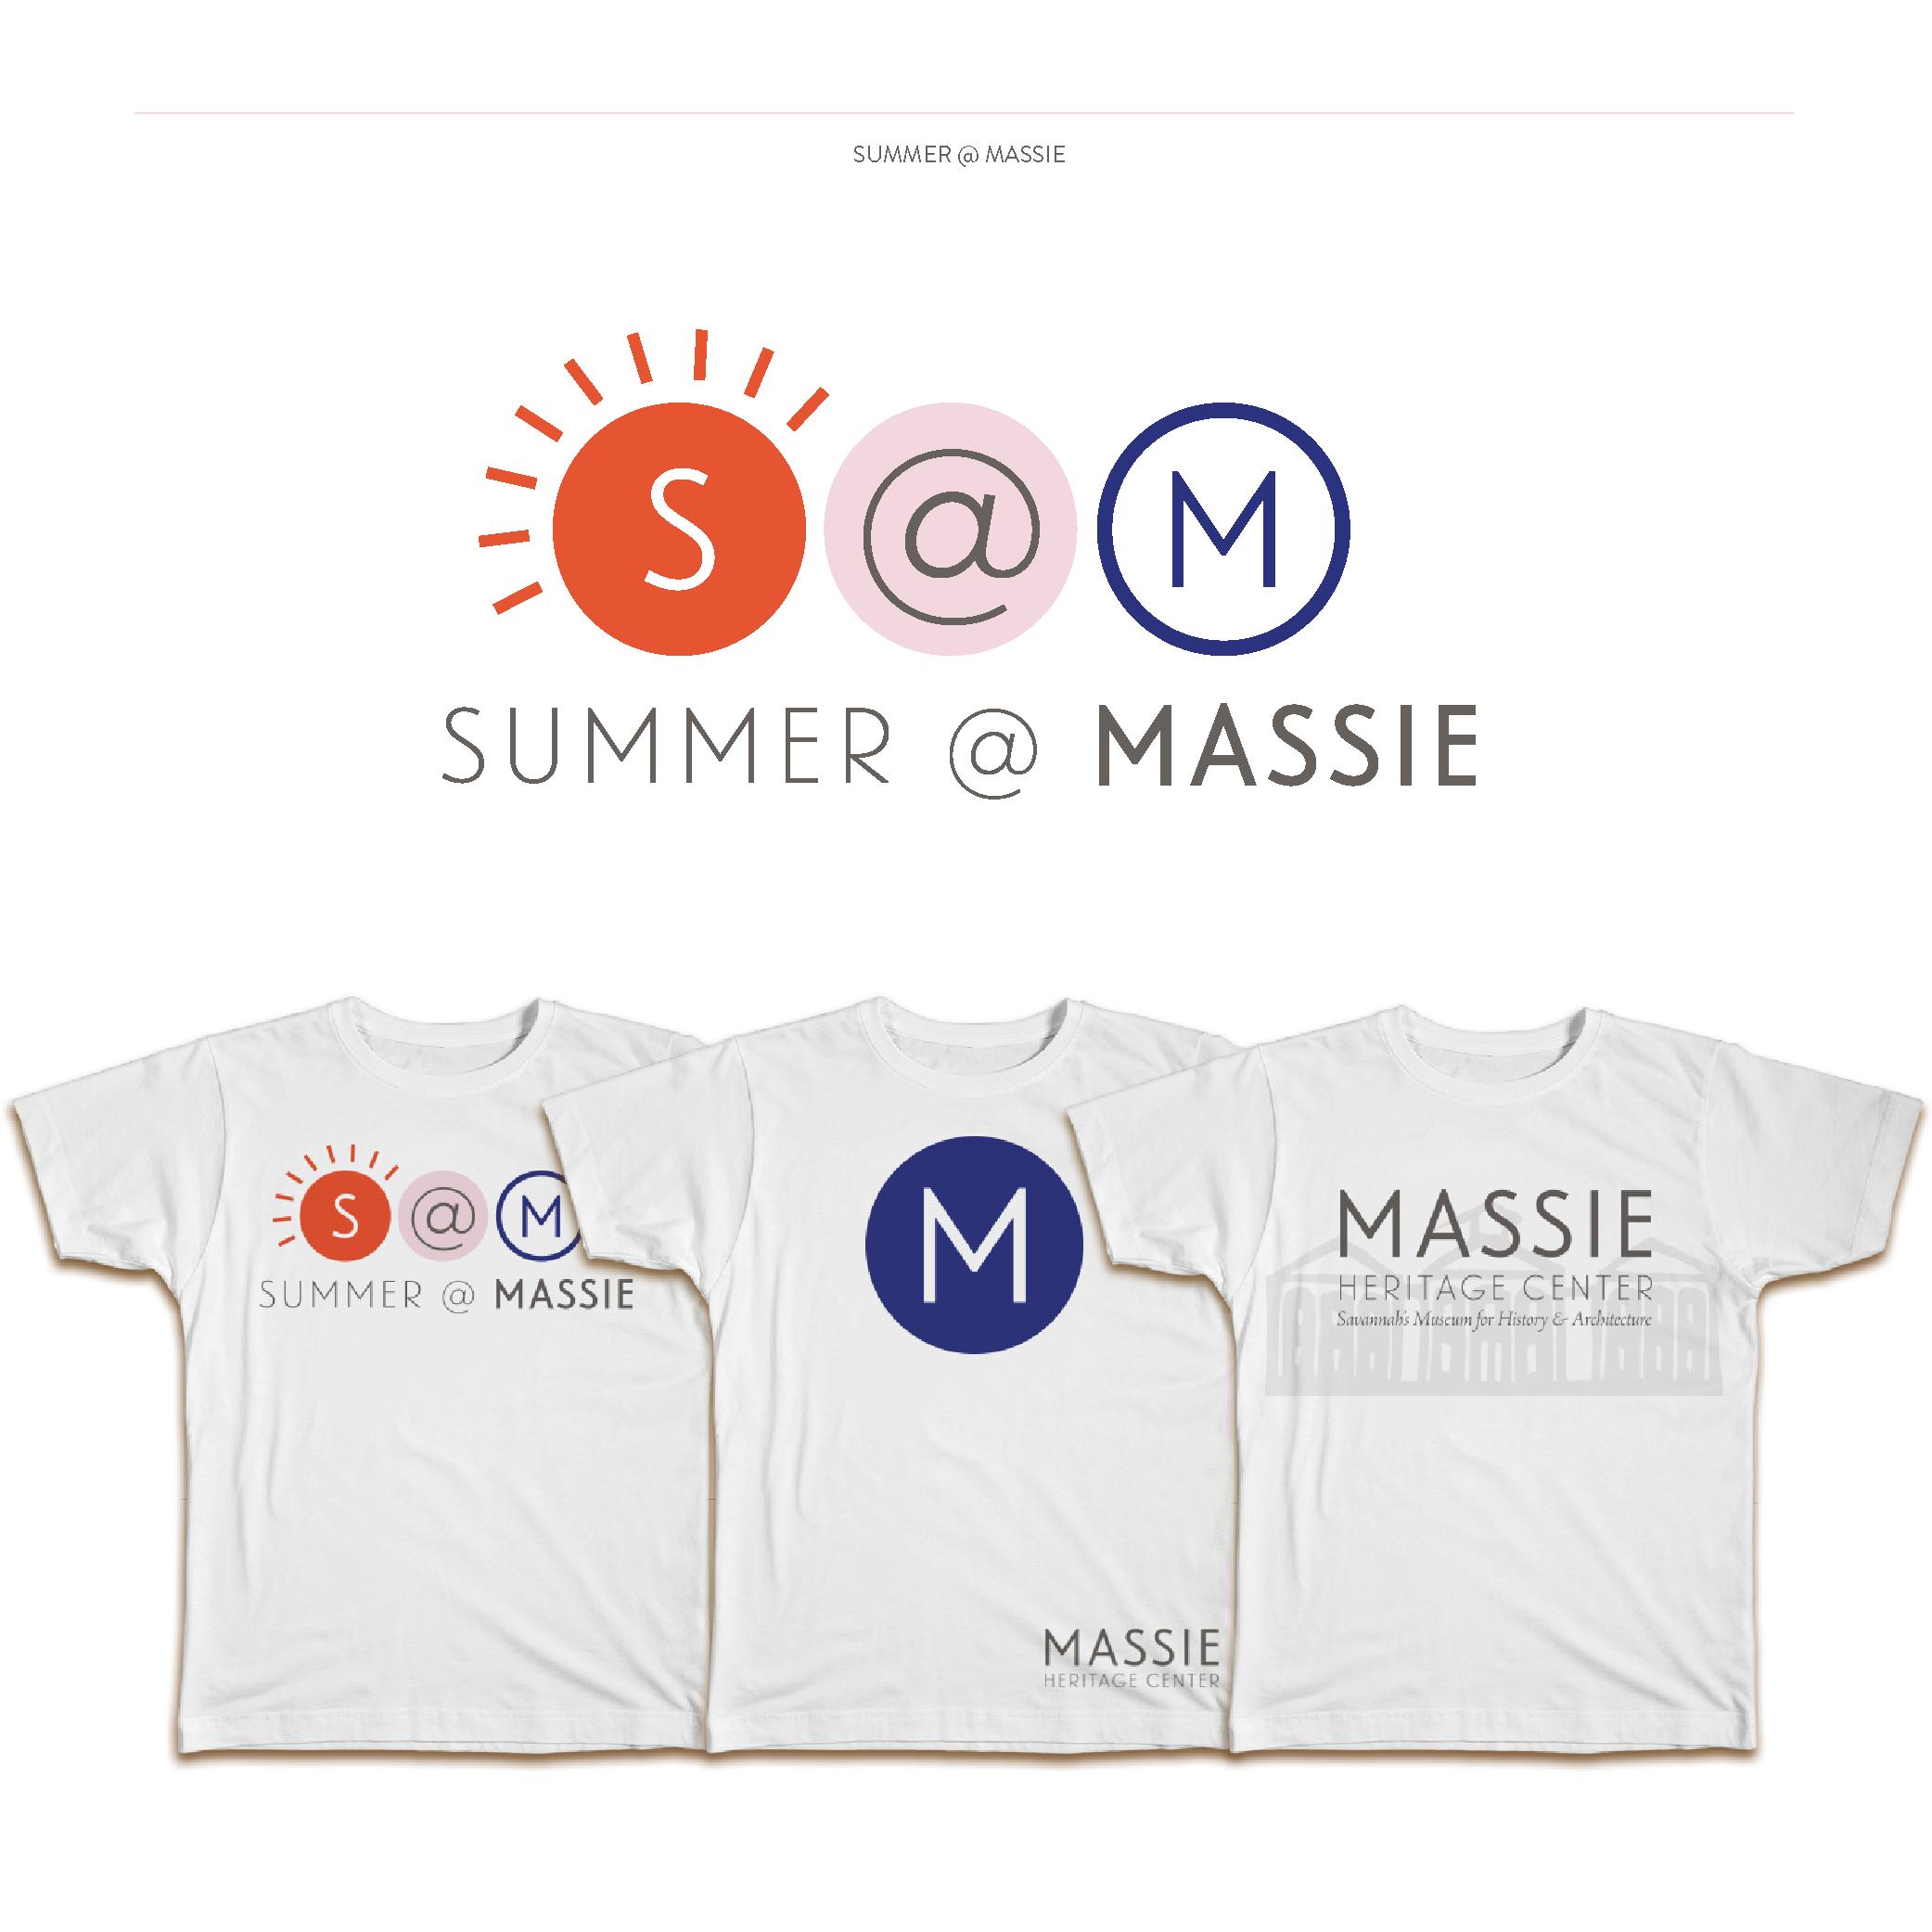 Custom Shirts | Massie Heritage Center